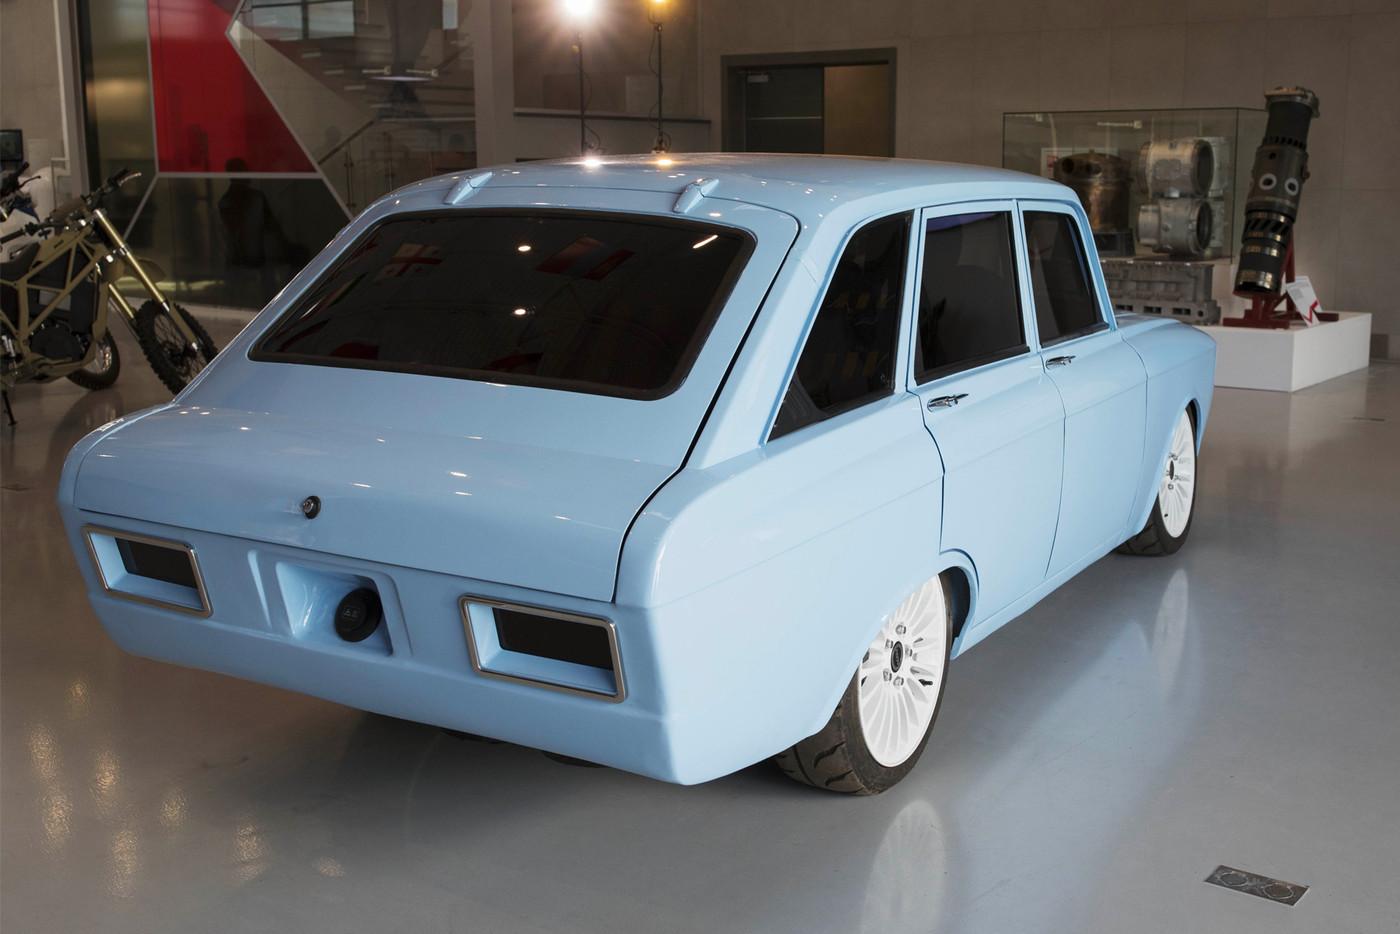 https_hypebeast.comimage201808kalashnikov-electric-supercar-cv-1-prototype-izh-2125-kombi-004